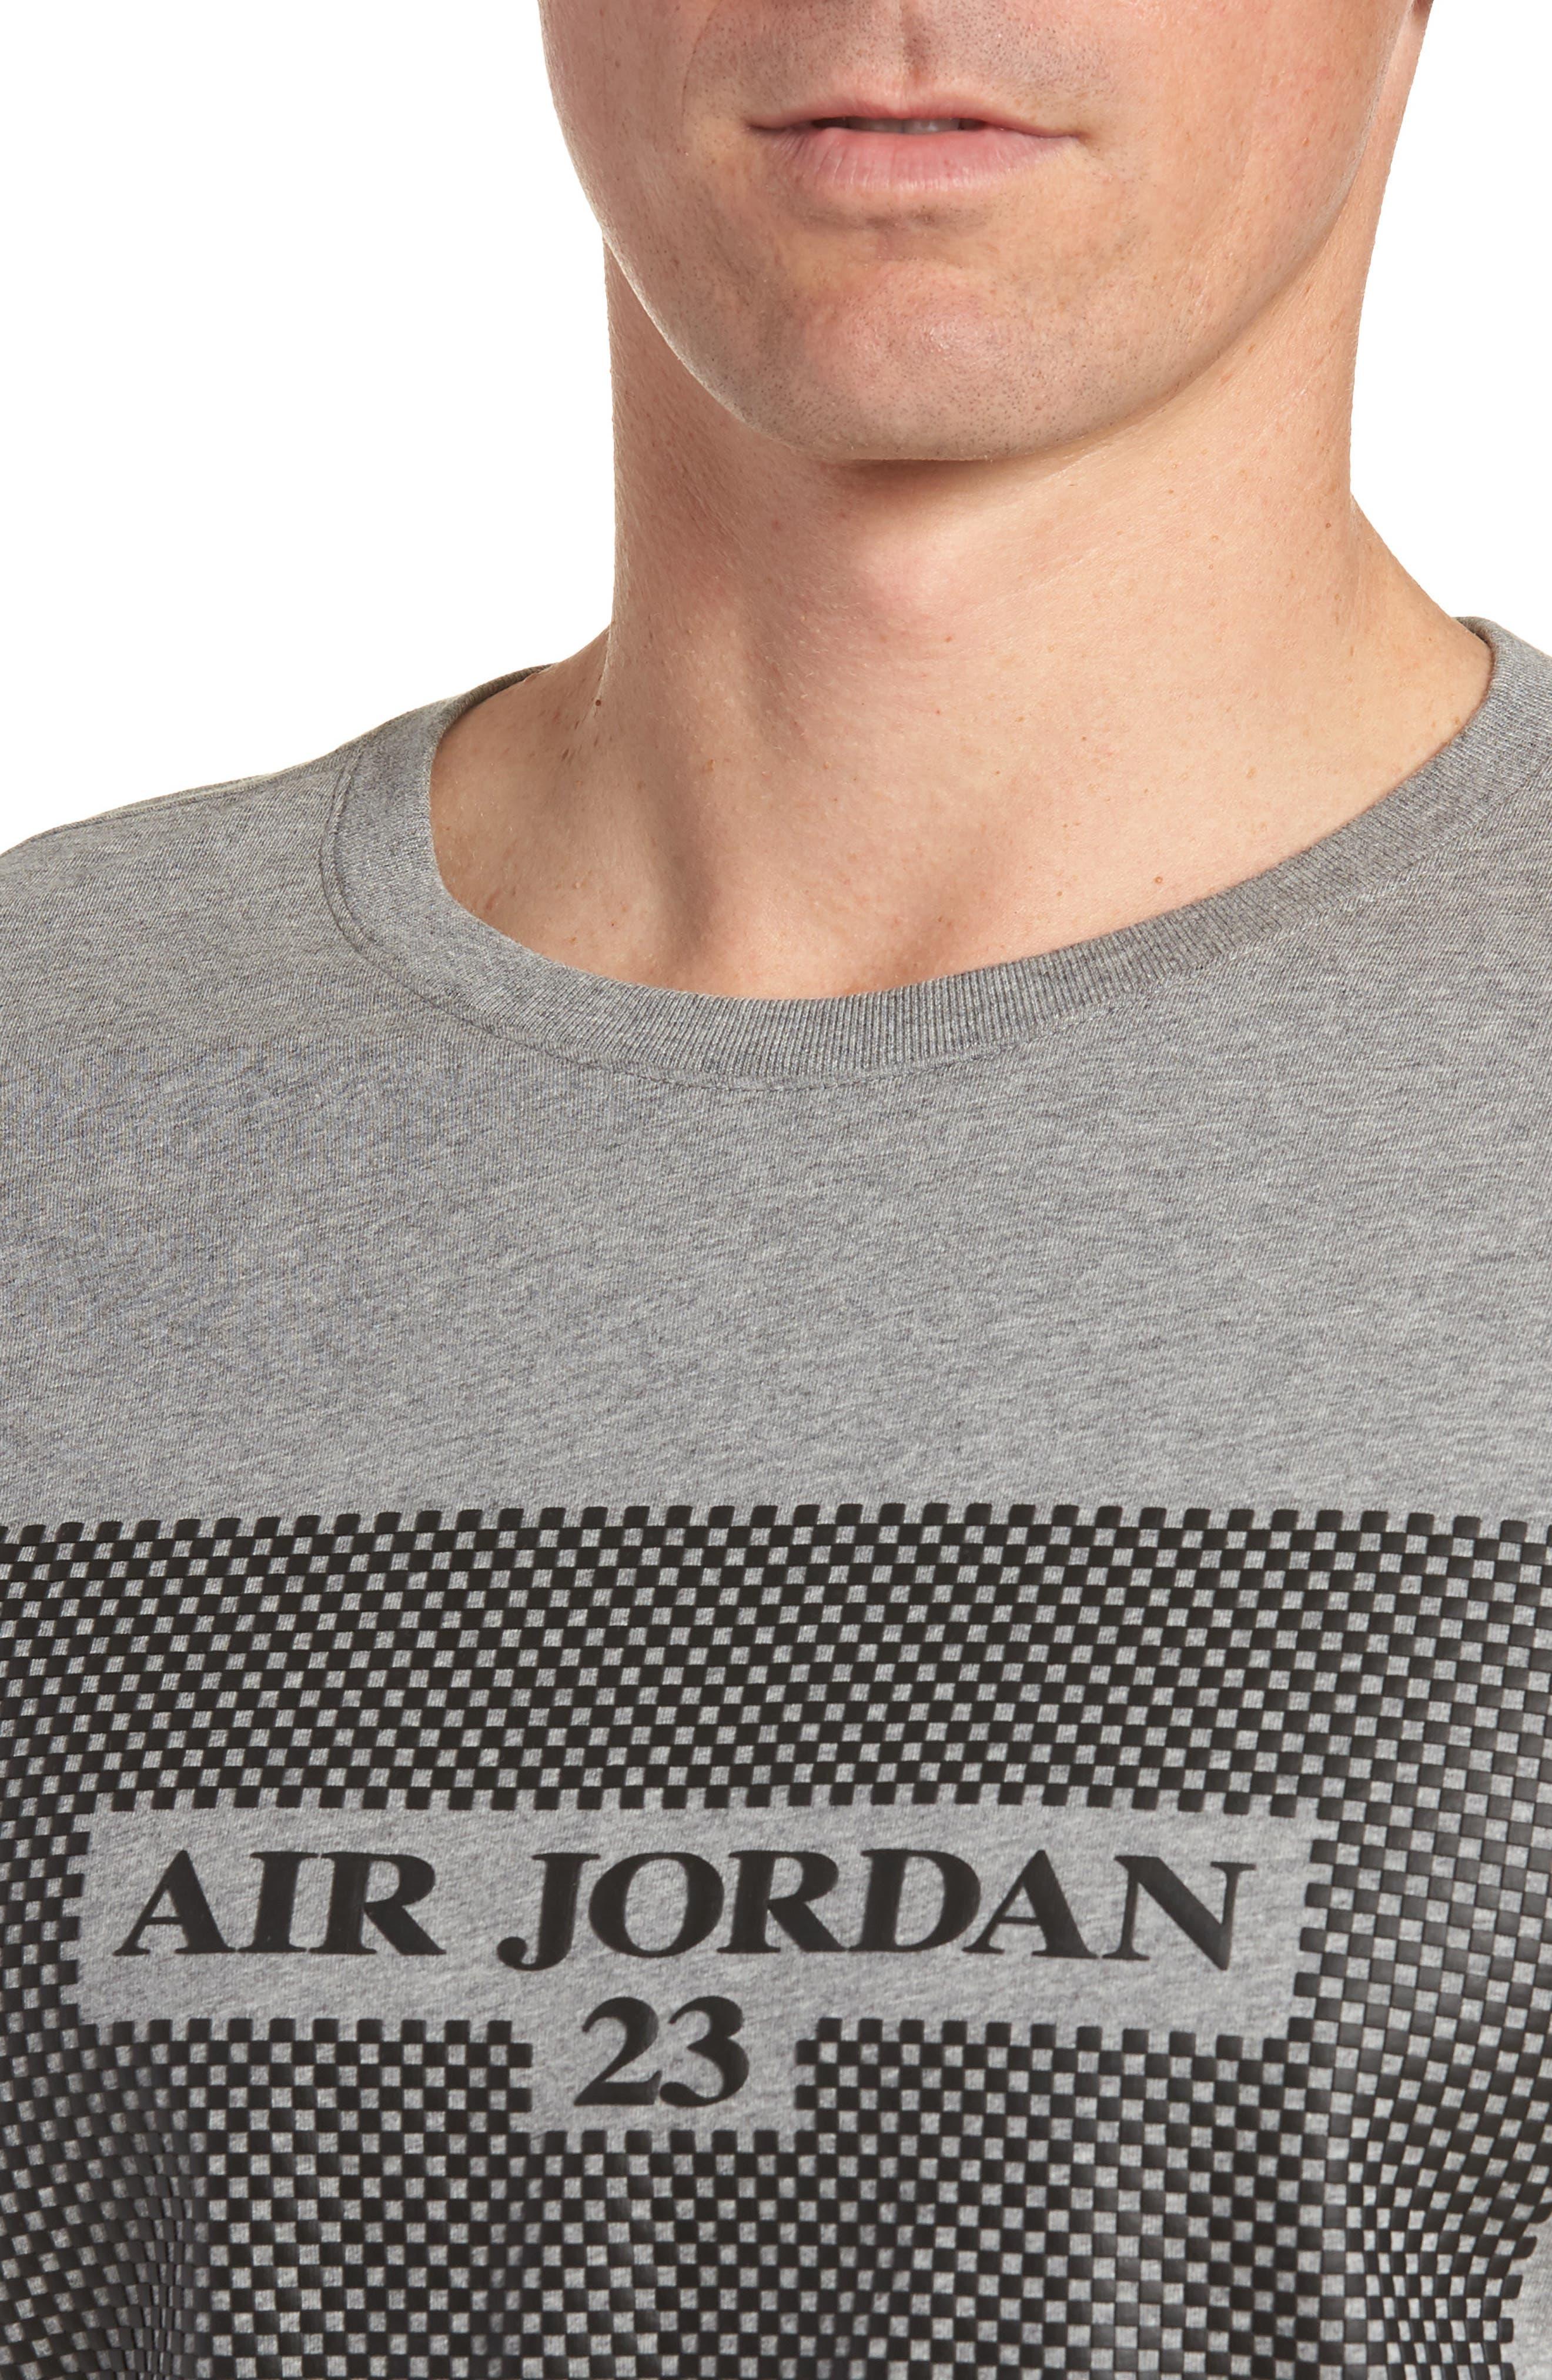 Air Jordan 23 T-Shirt,                             Alternate thumbnail 4, color,                             CARBON HEATHER/ BLACK